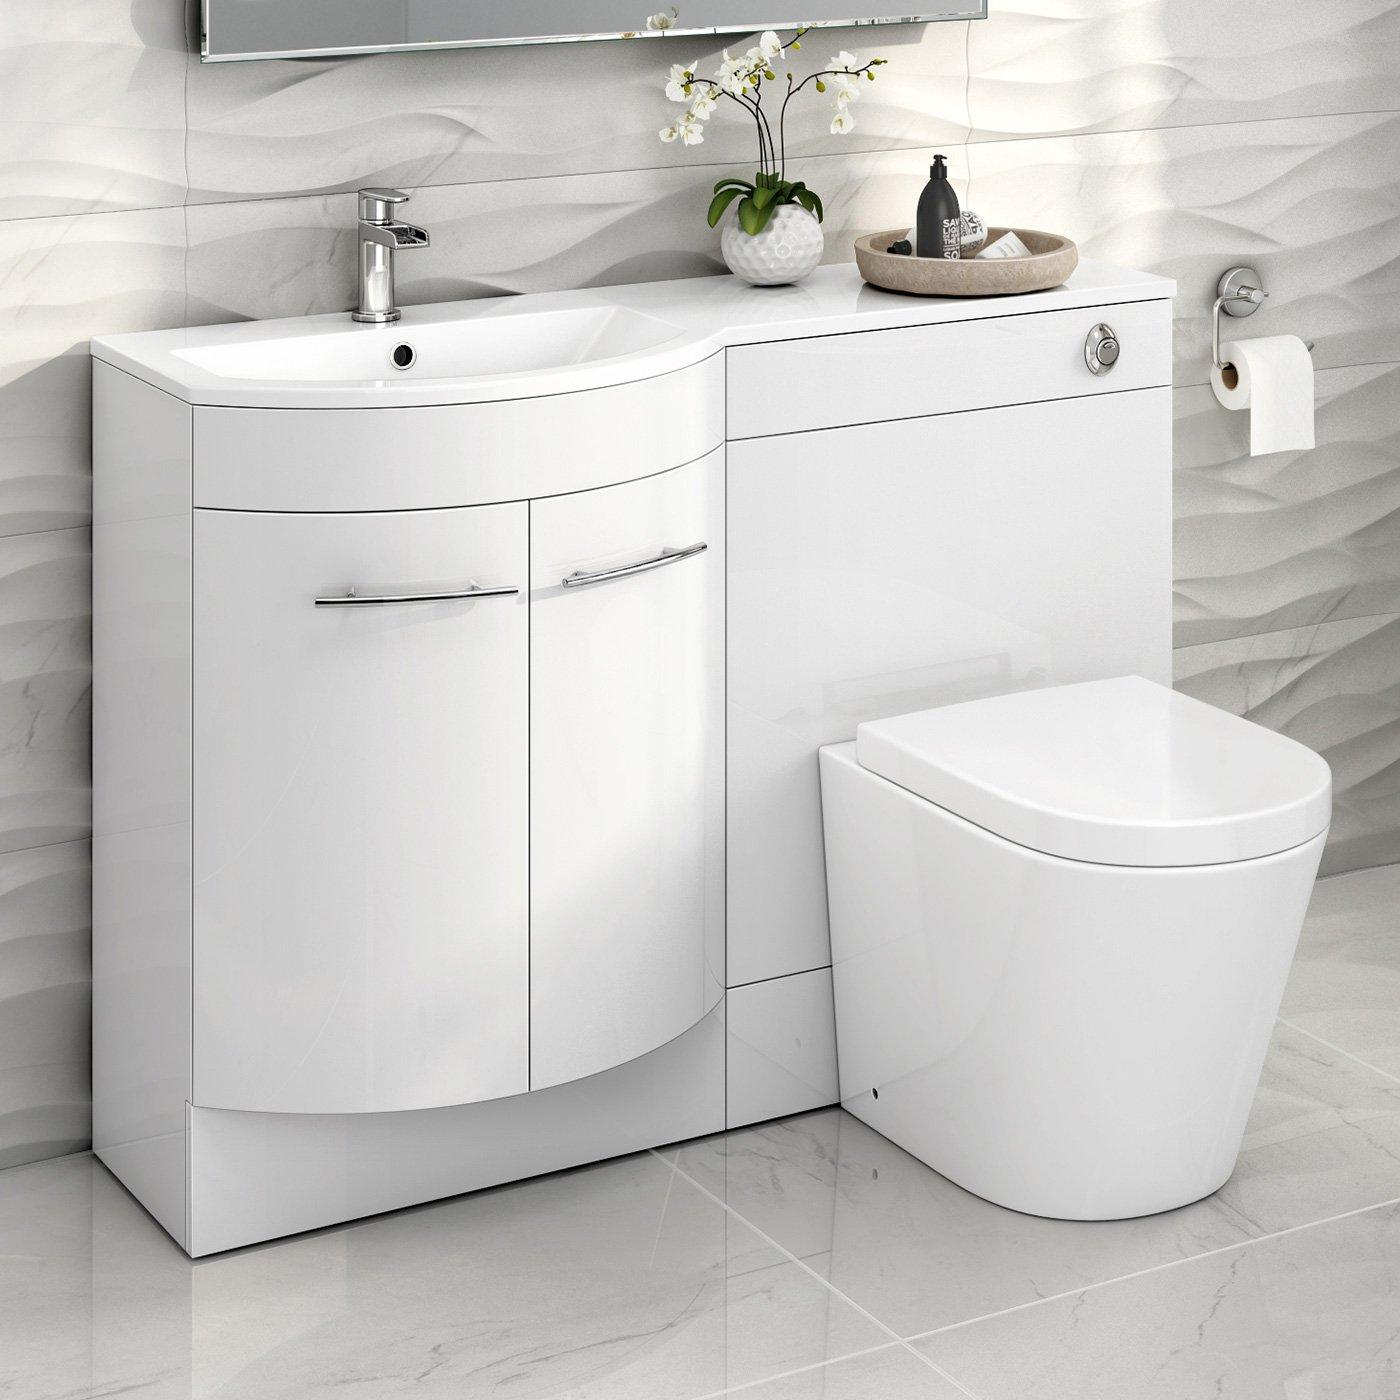 1200 Mm White Vanity Unit Countertop Basin Toilet Bathroom Furniture Set Mv1610 Buy Online In Cayman Islands At Cayman Desertcart Com Productid 54509304